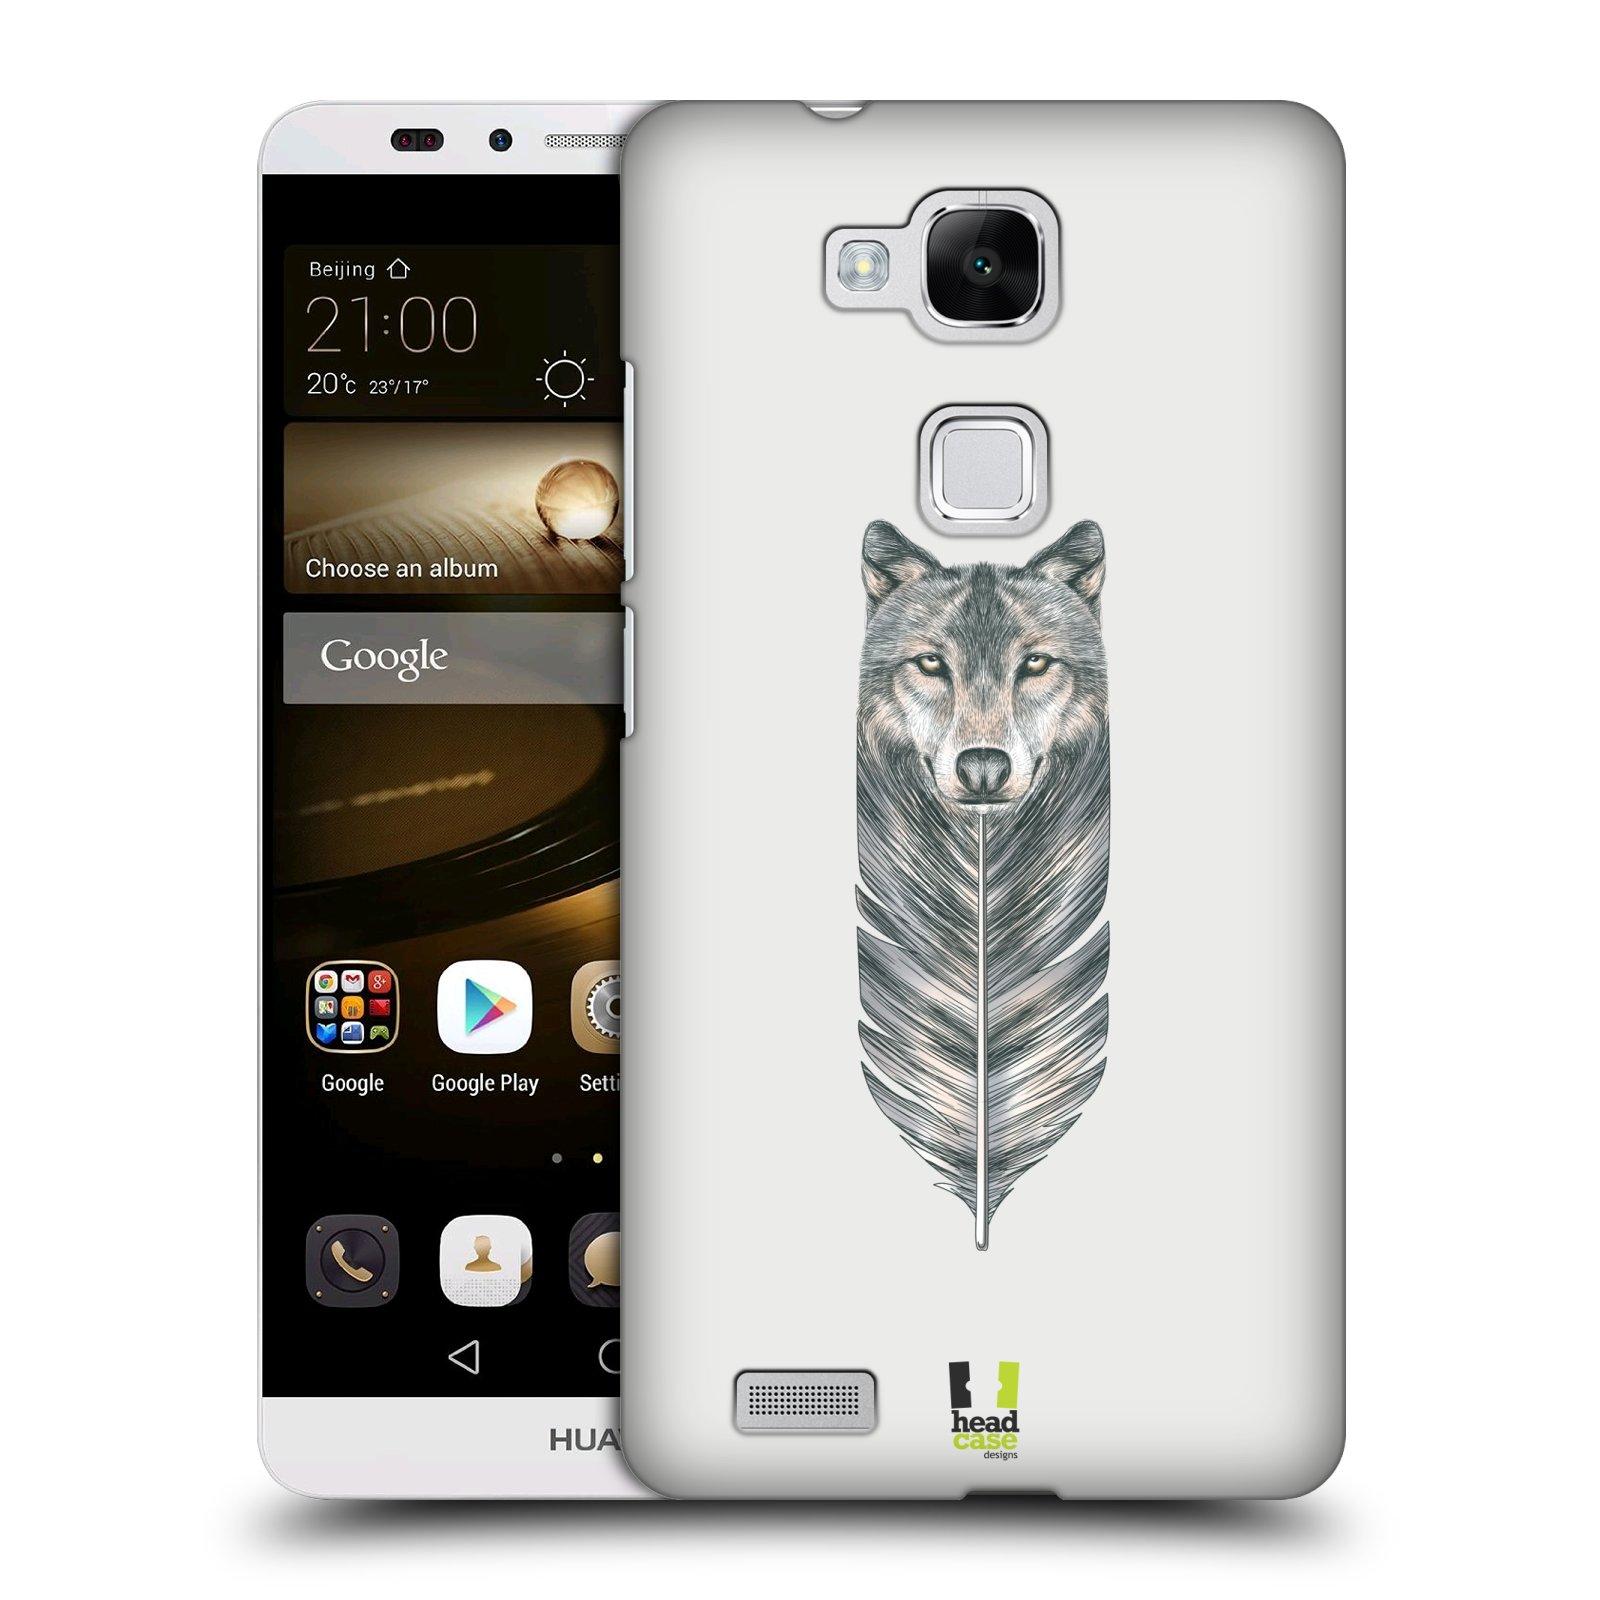 HEAD CASE plastový obal na mobil Huawei Mate 7 vzor zvířecí pírka vlk